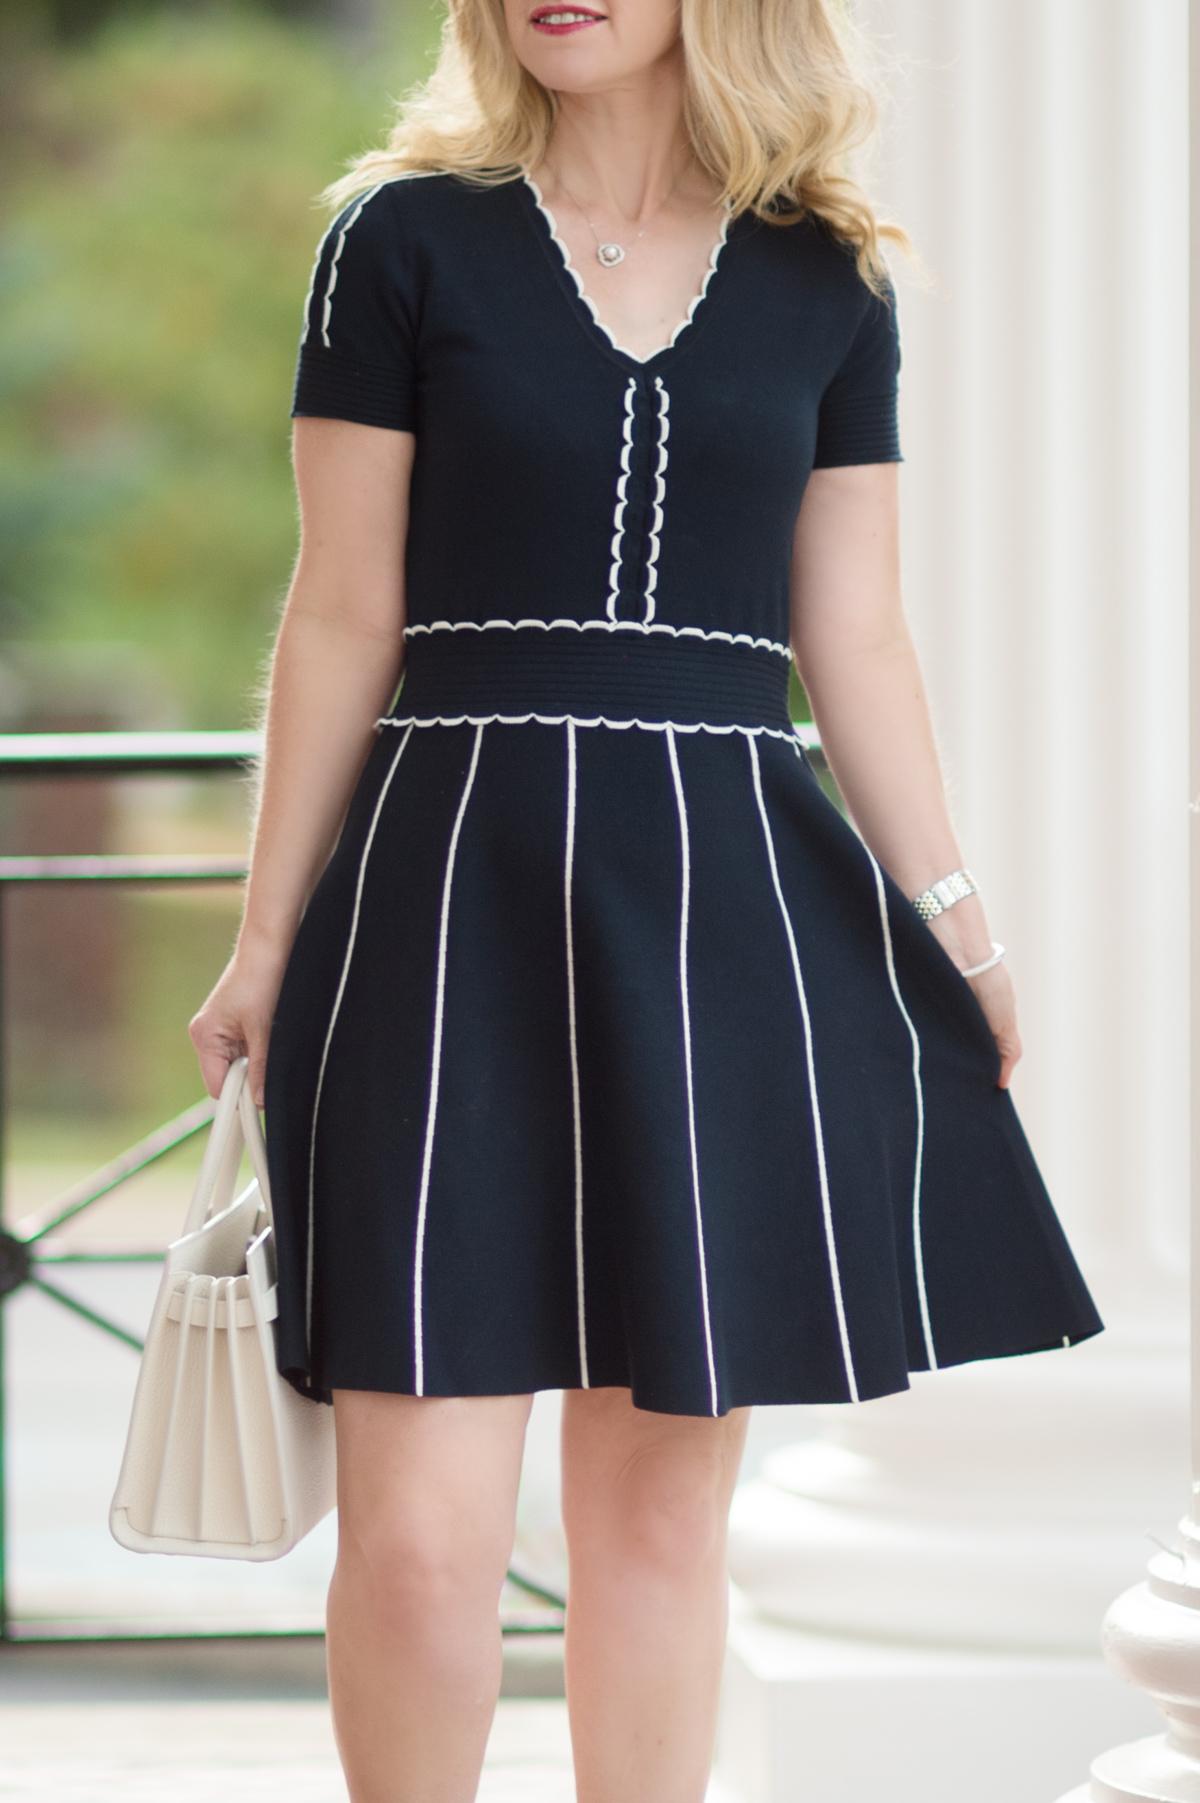 2167730c5c Petite Fashion and Style Blog